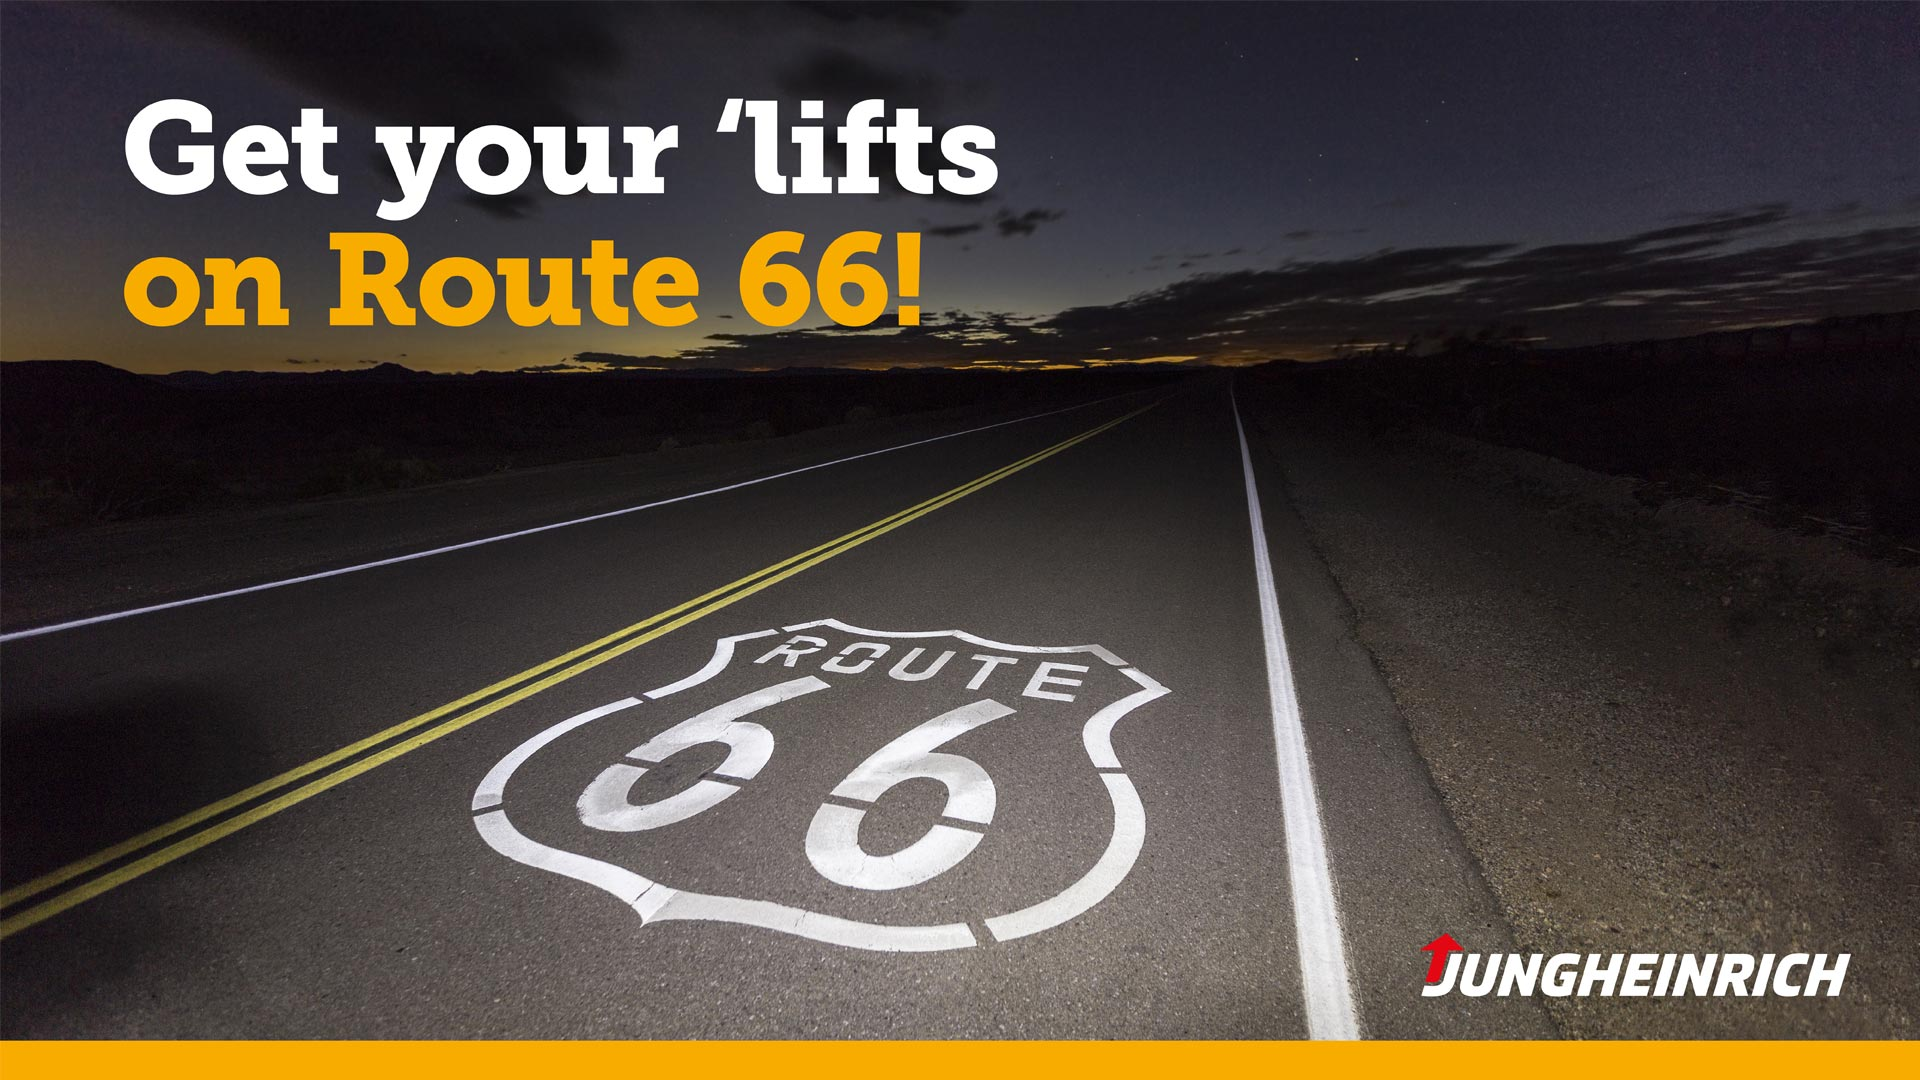 Jungheinrich campaign route 66